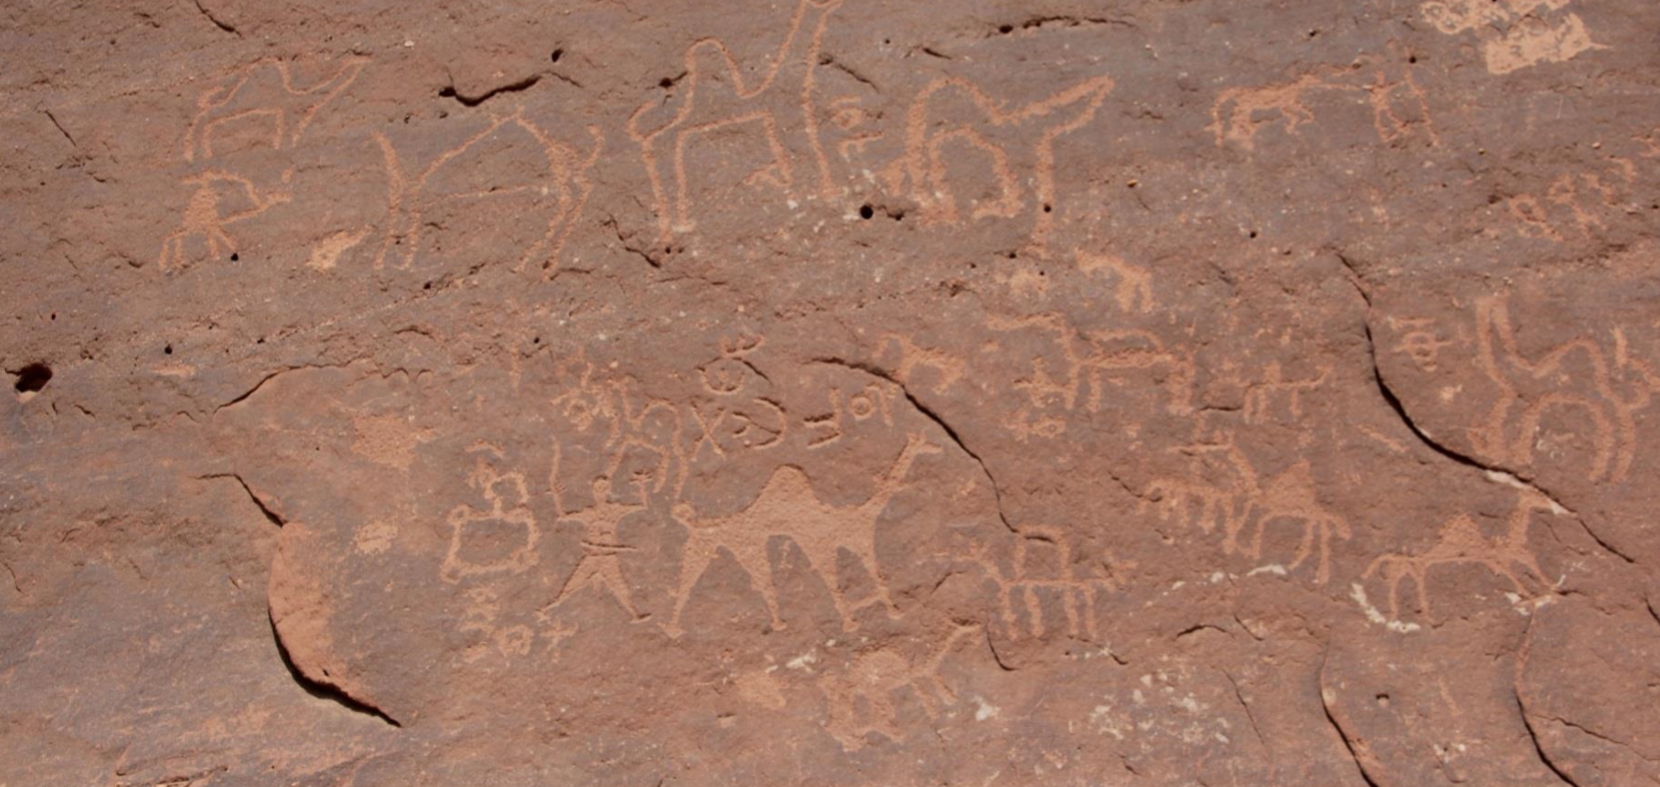 kiveen kaiverrettuja kameleita